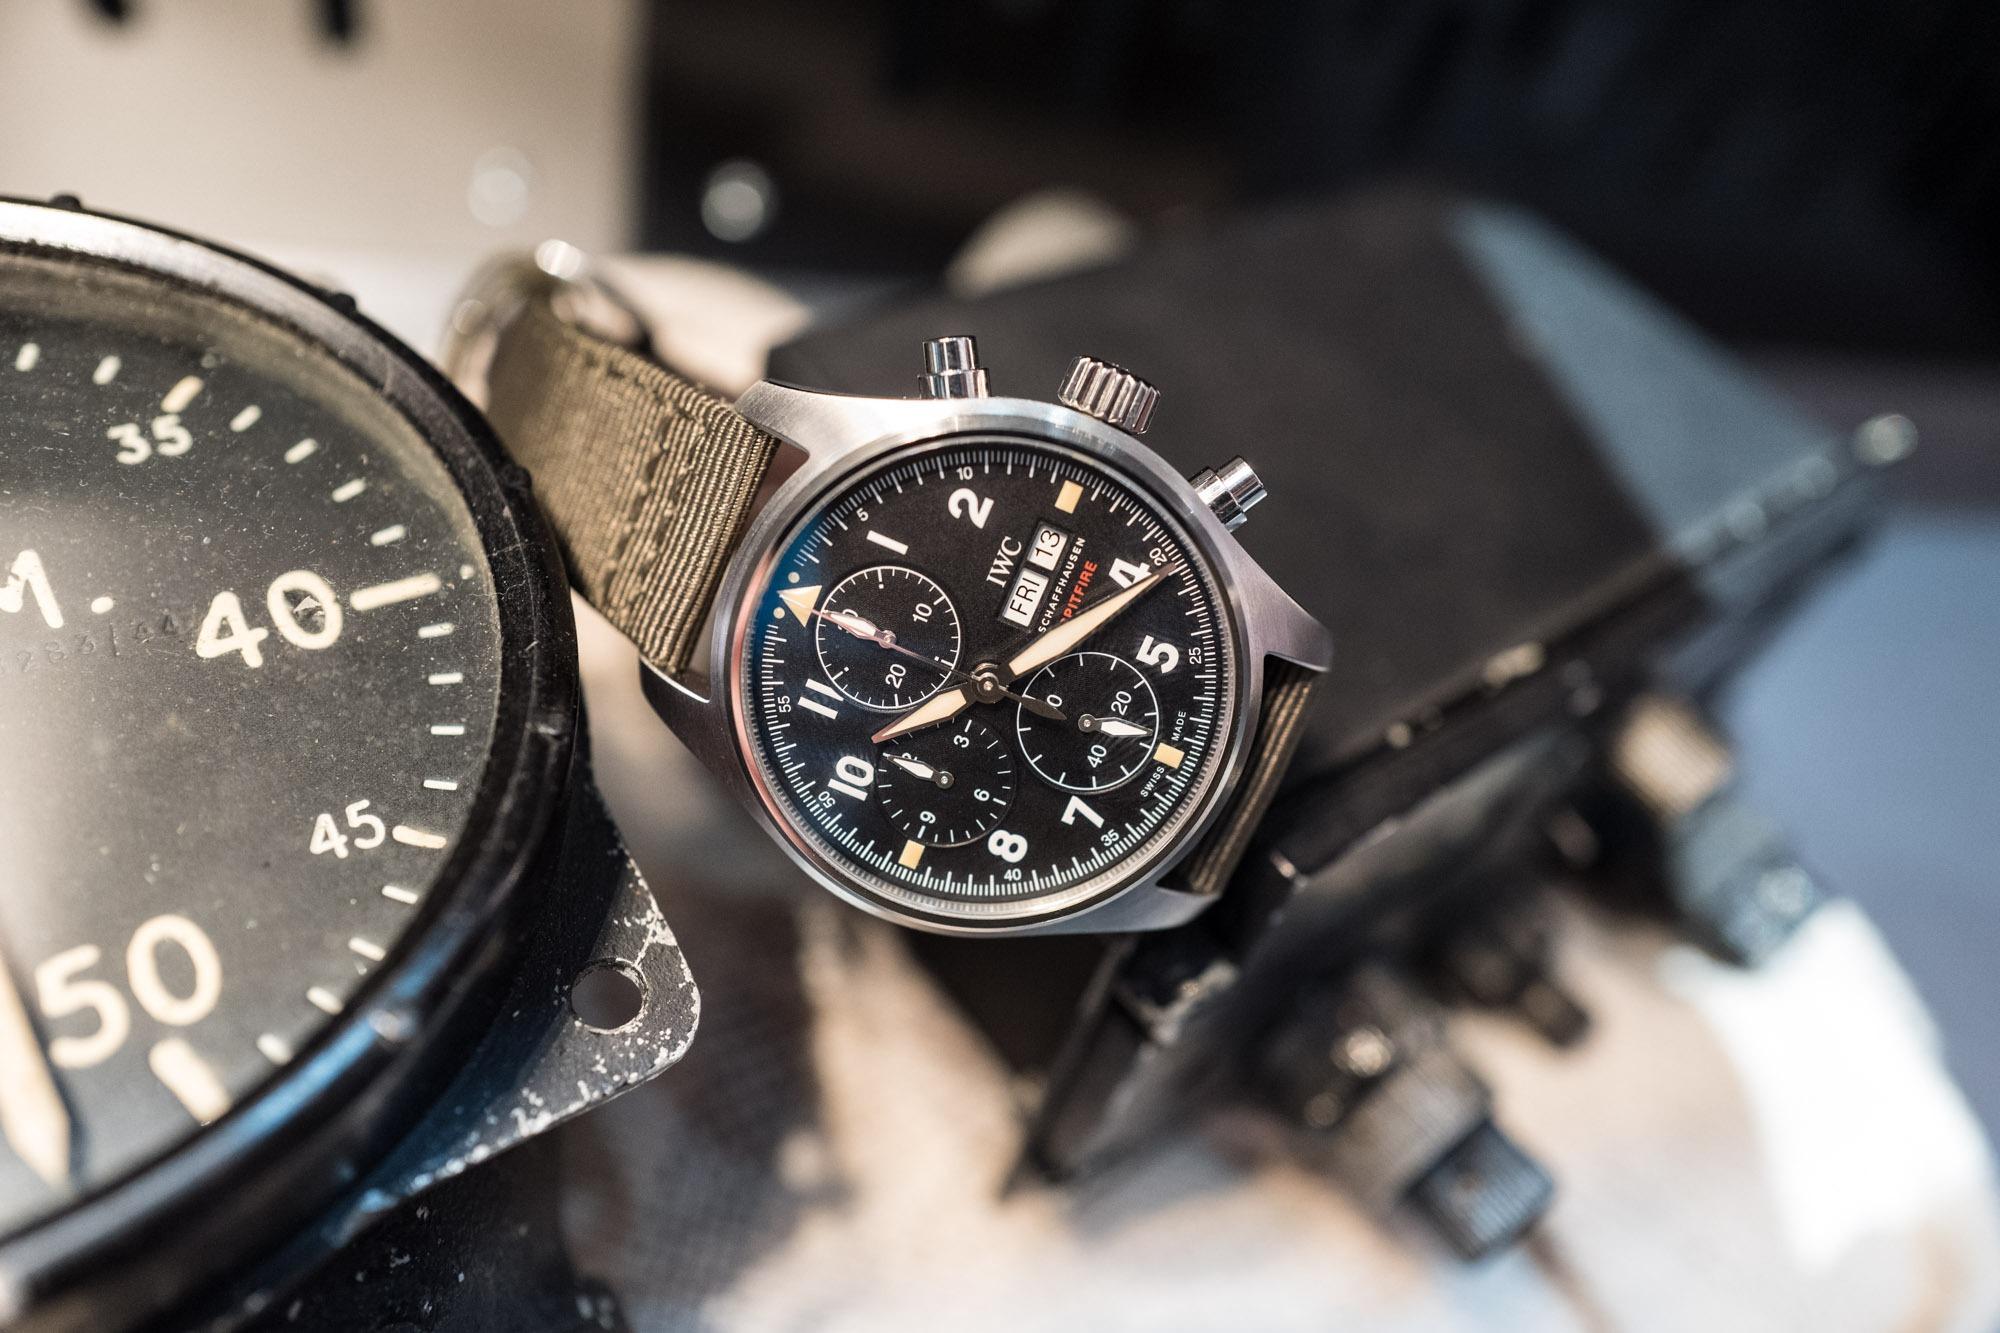 IWC - SIHH 2019 - Montre d'Aviateur Chronographe Spitfire